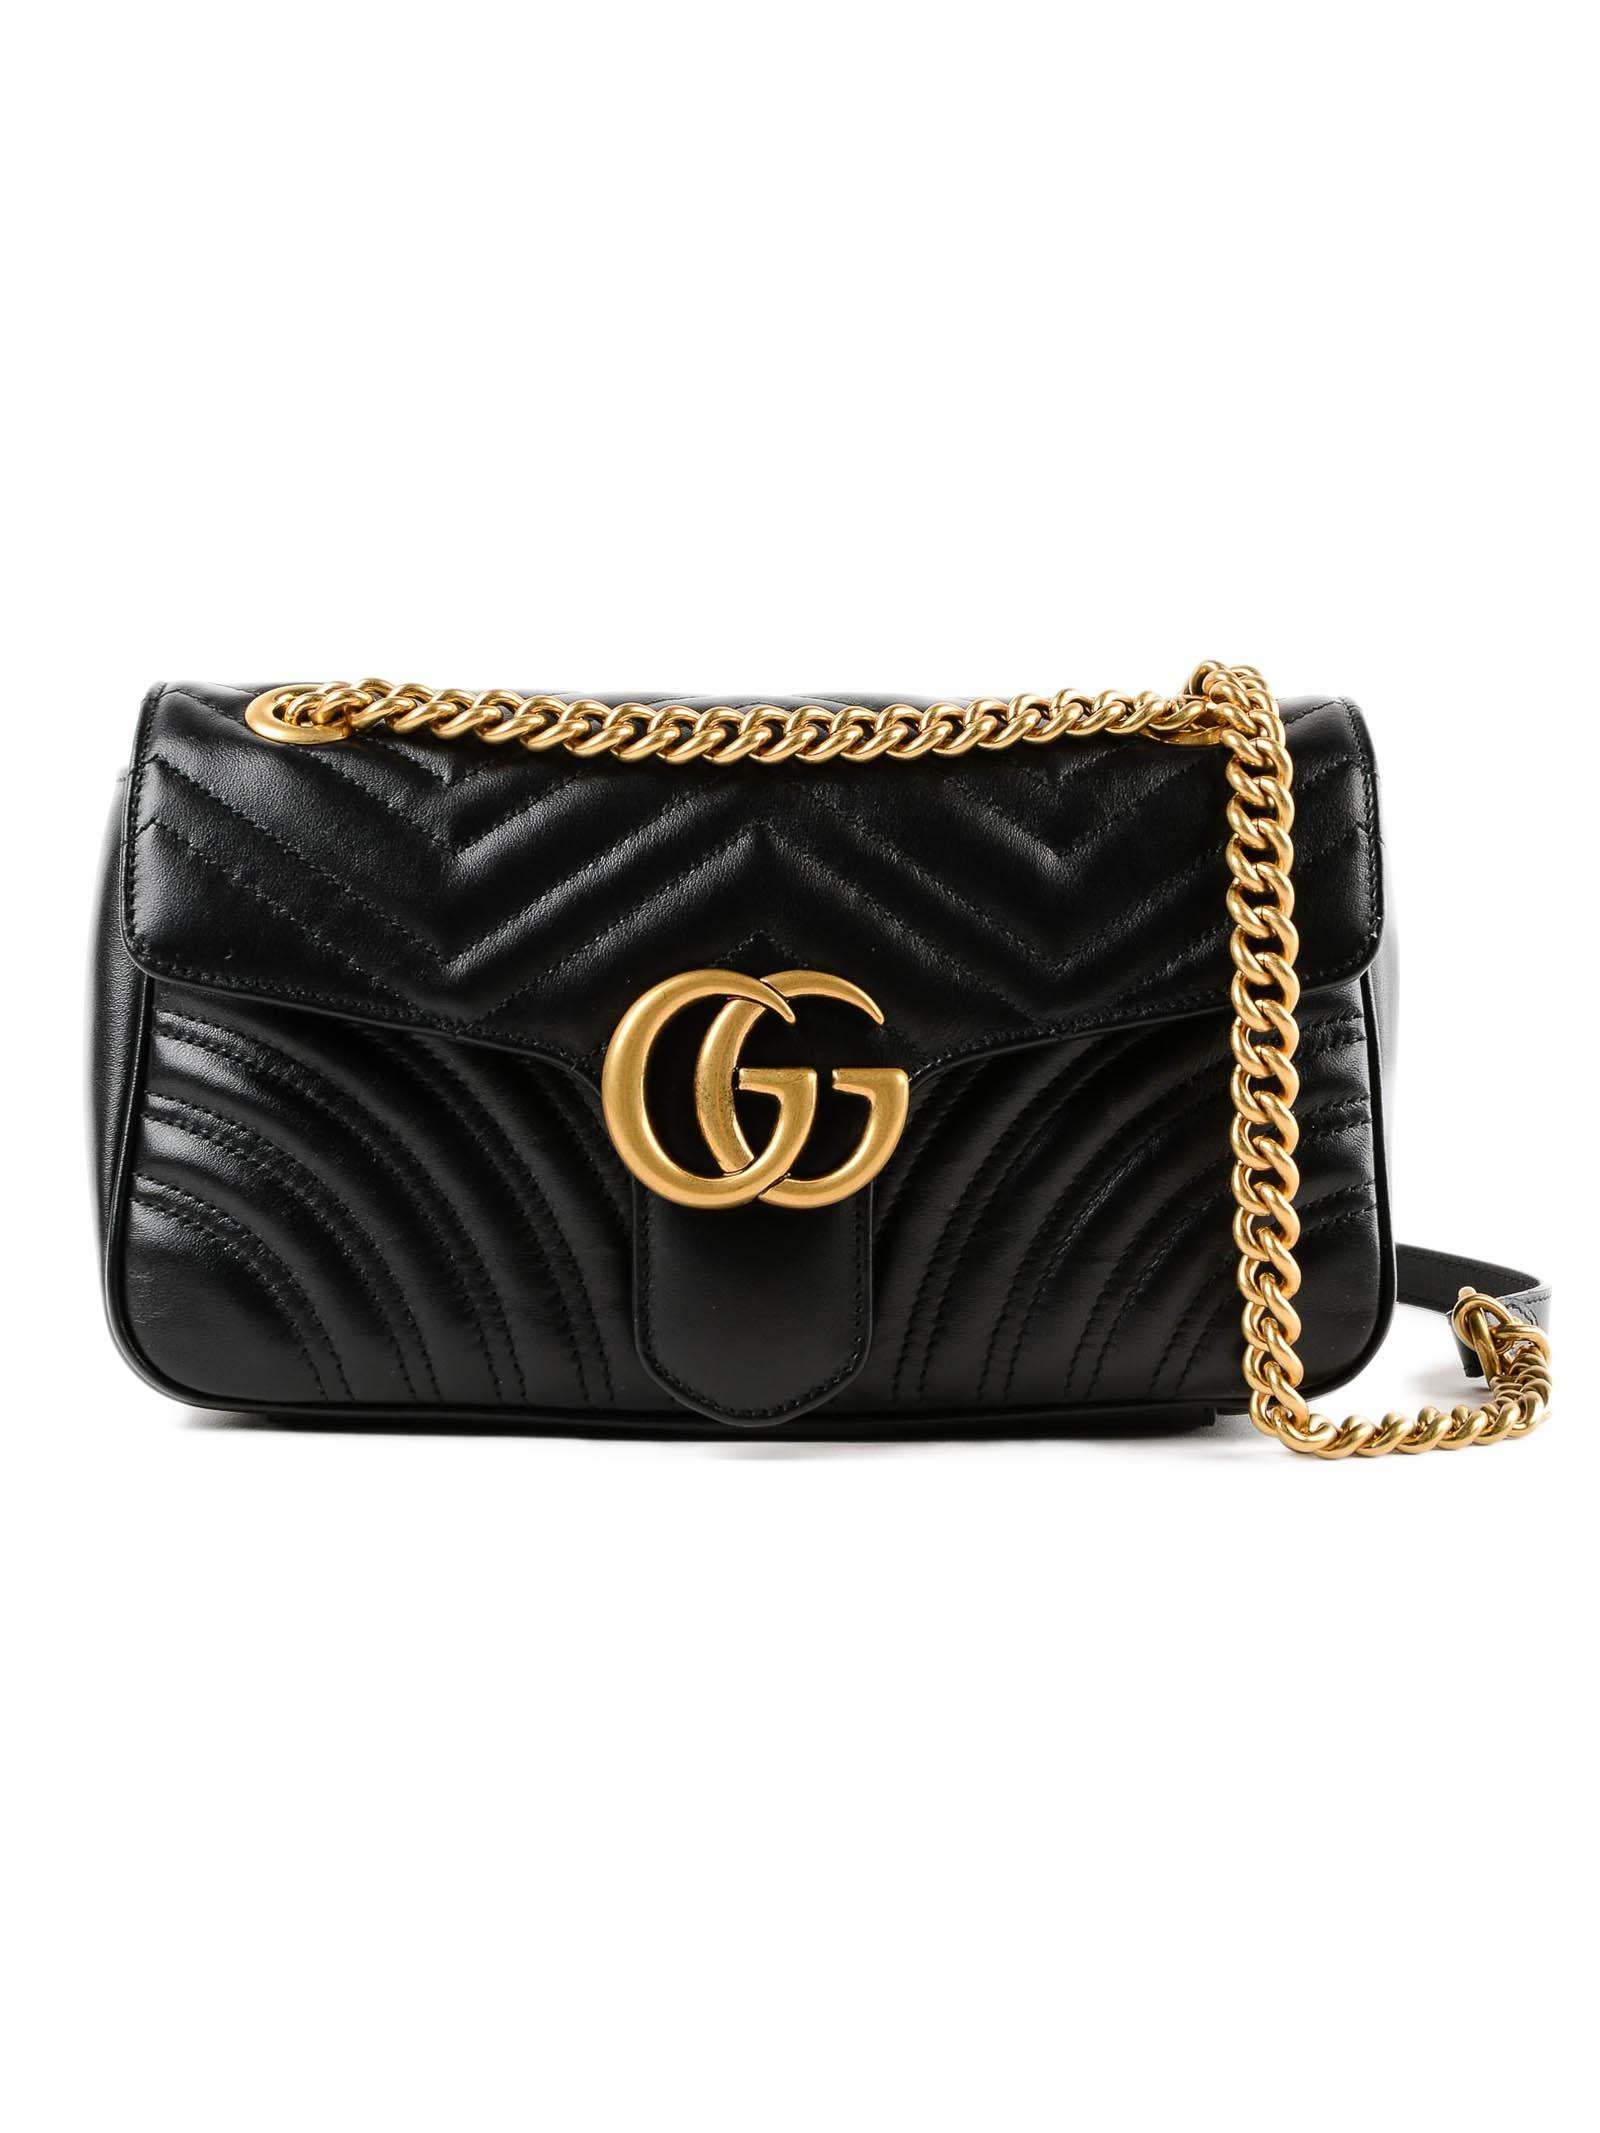 7613a2afb09 Lyst - Gucci W Gg Marmont 2.0 Bag in Black